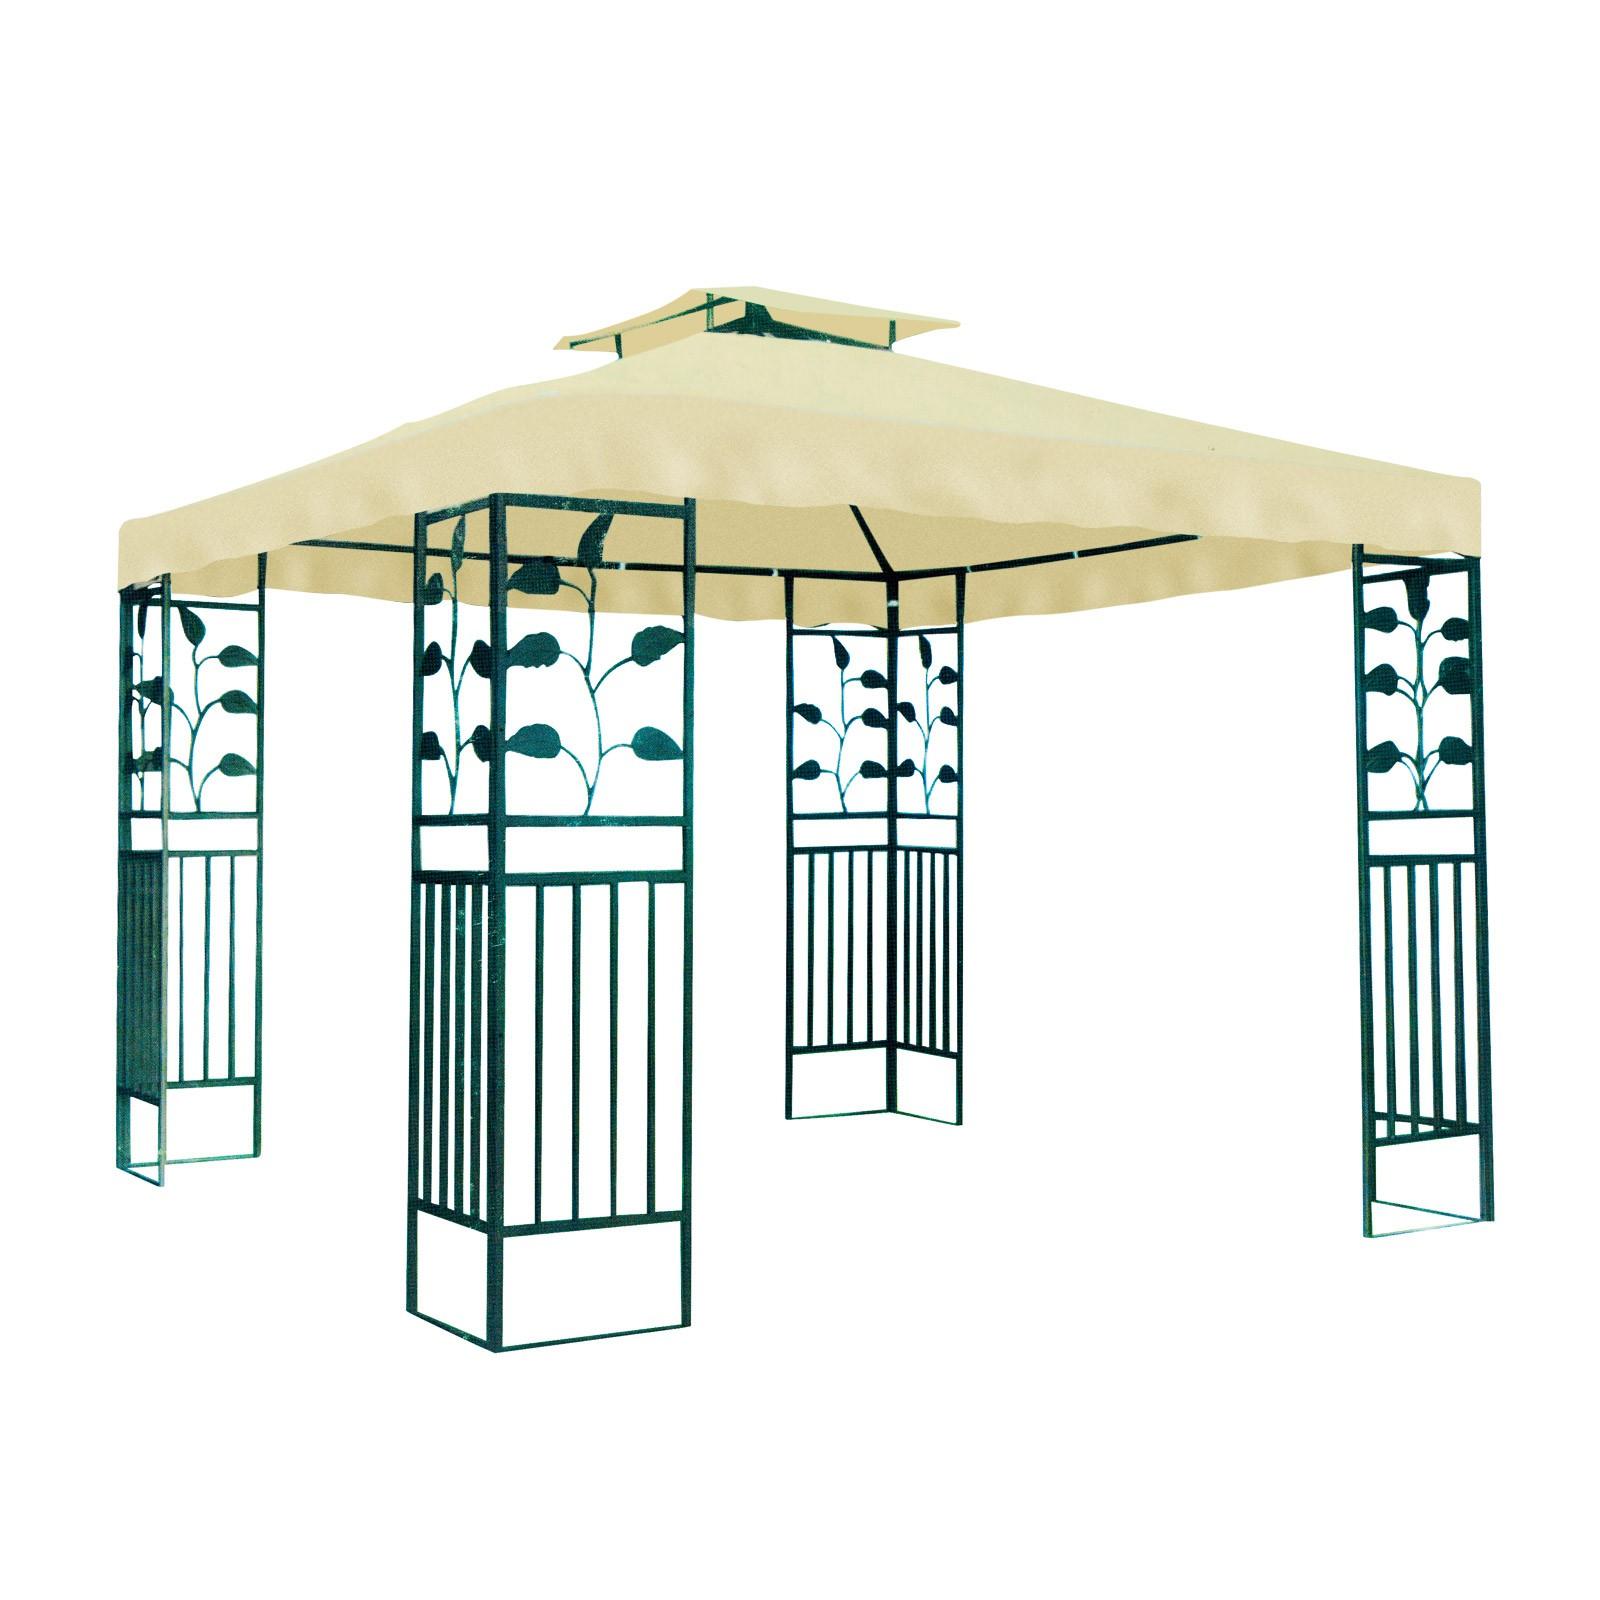 Metall Gartenpavillon 3 X 3 M Pavillon